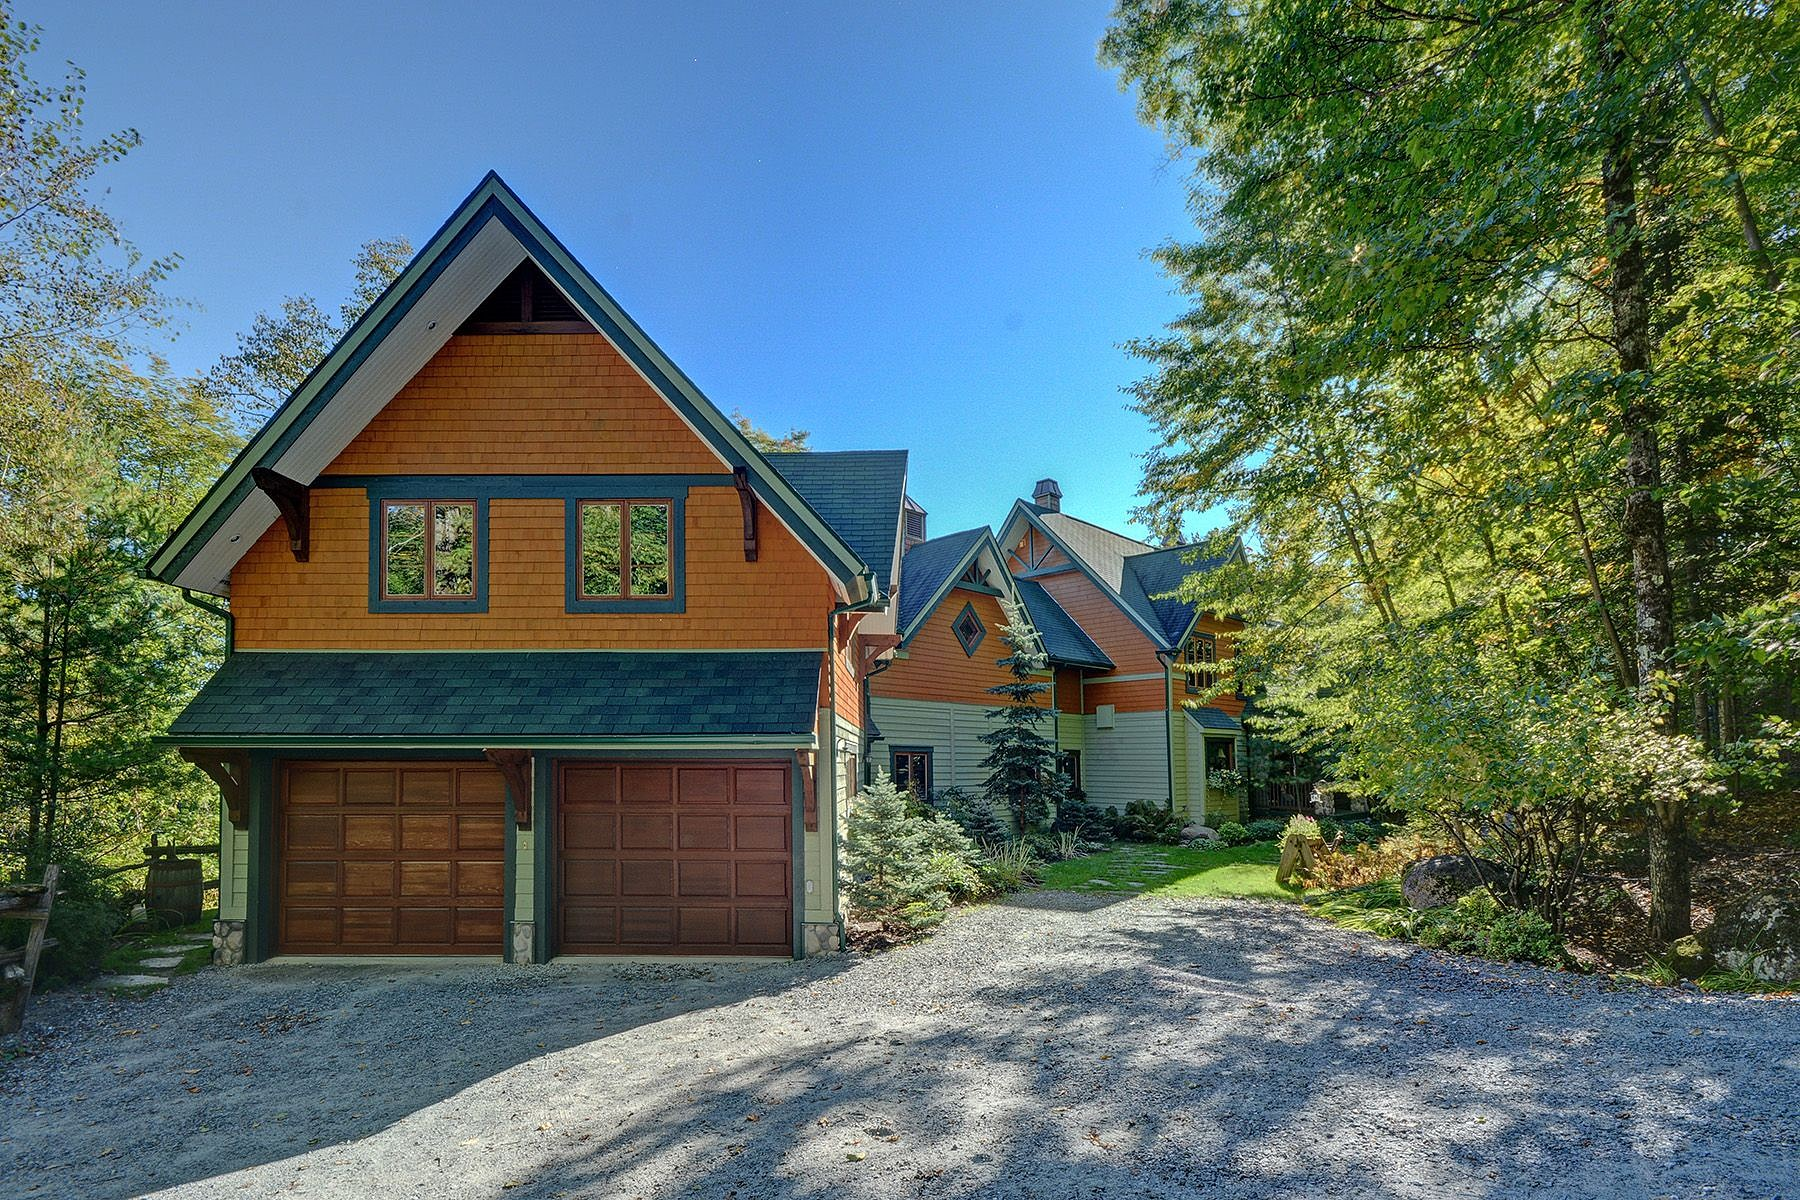 Other Residential for Sale at Mont-Tremblant, Laurentides 137 Ch. du Belvédère Mont-Tremblant, Quebec J8E1Z0 Canada